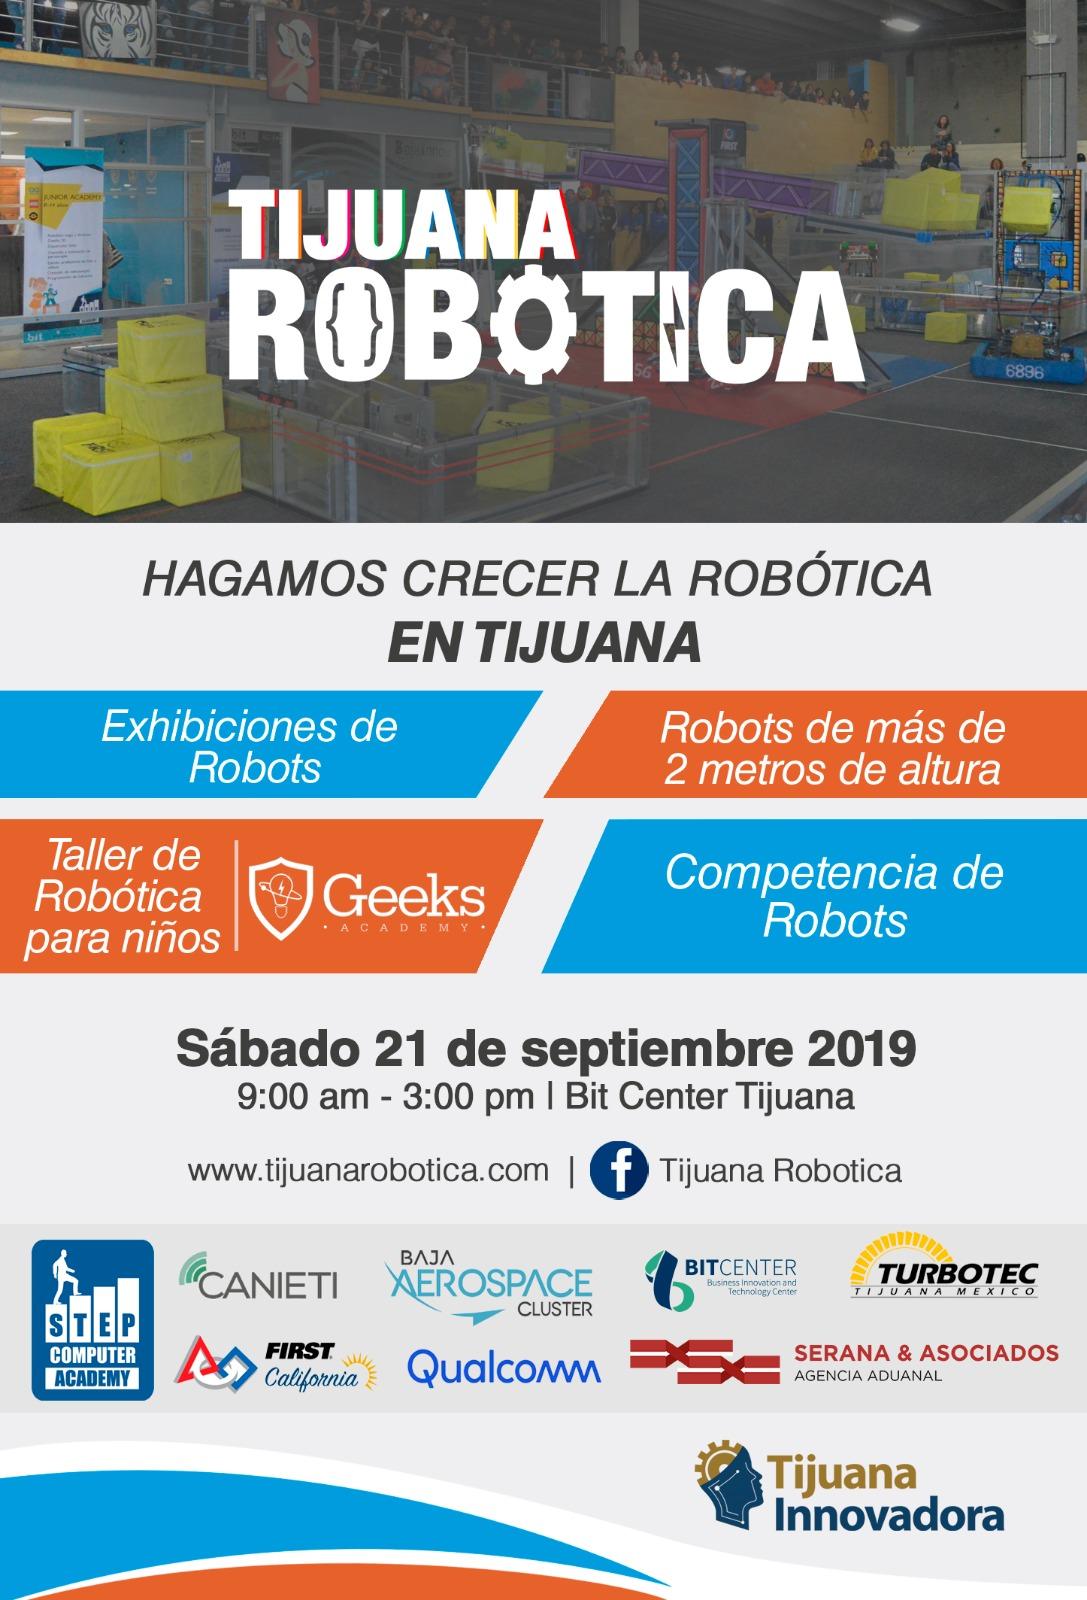 Invitan a exhibición internacional de robótica